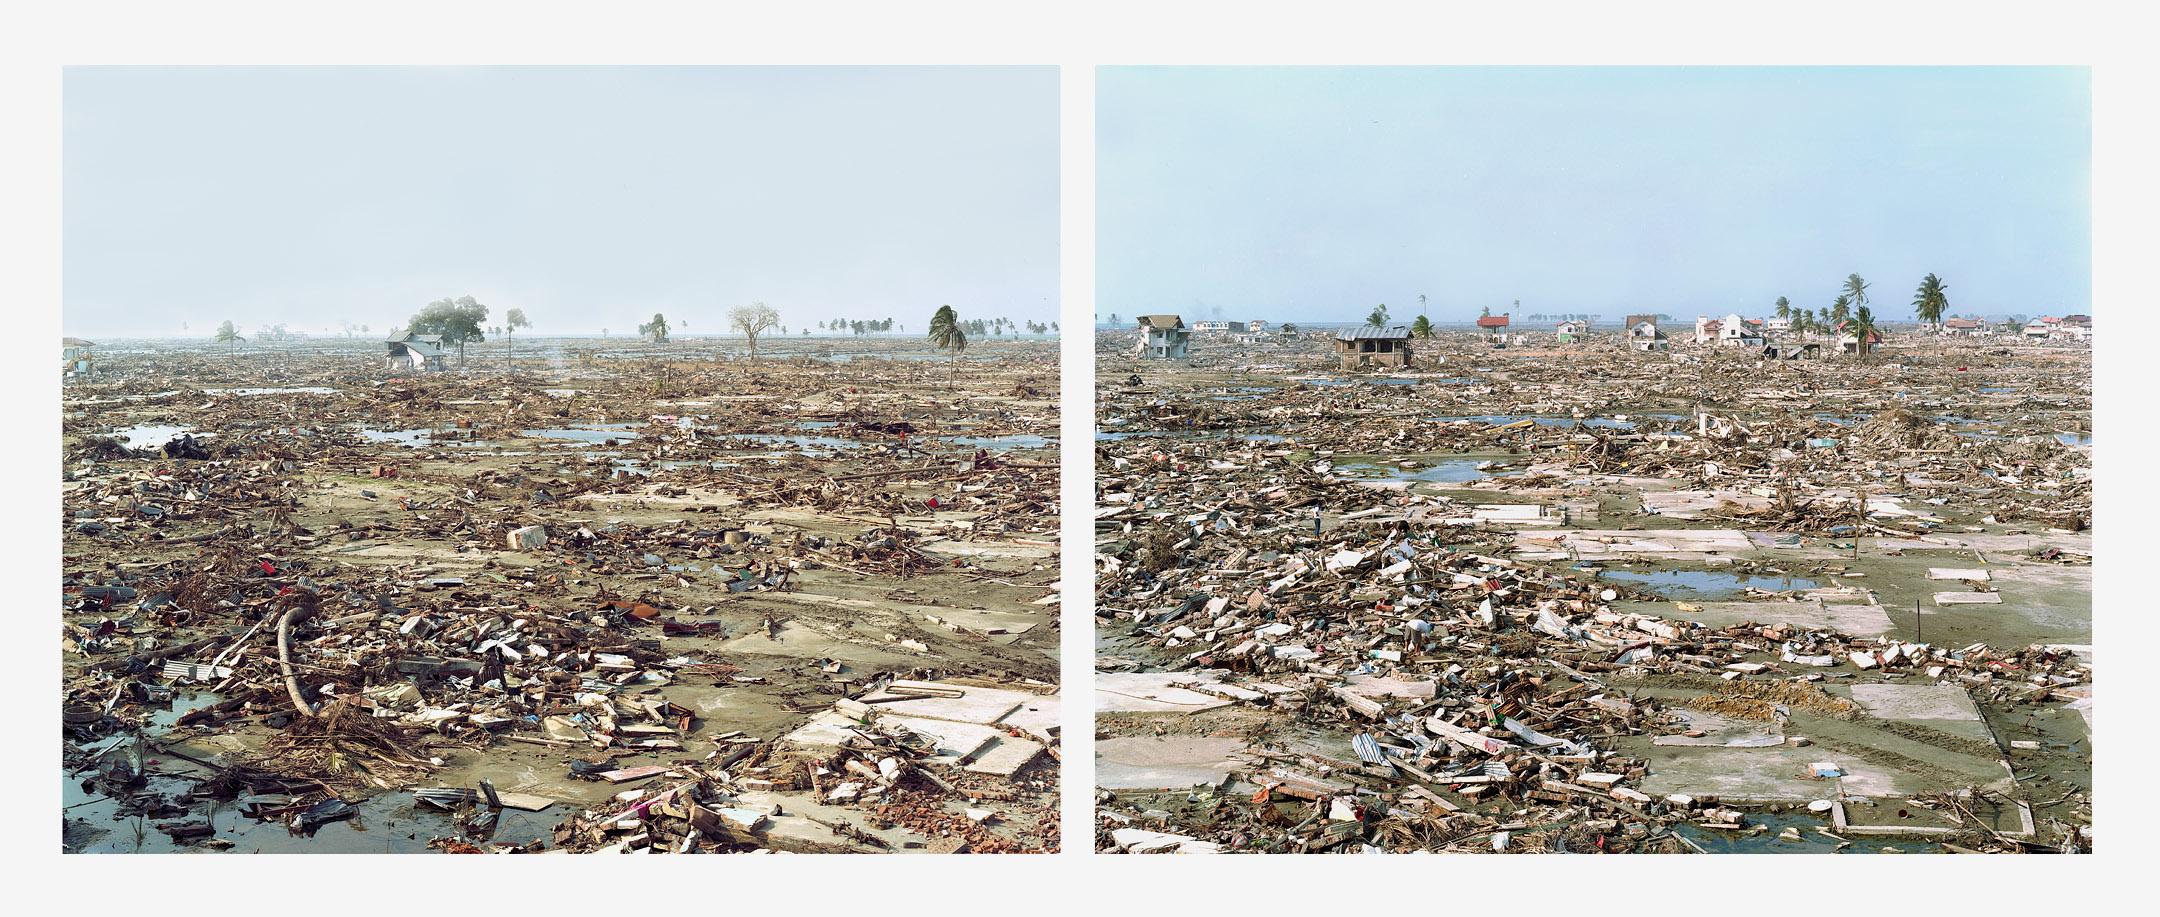 Sasha Bezzubov, Tsunami #2 diptych, Indonesia, 2005